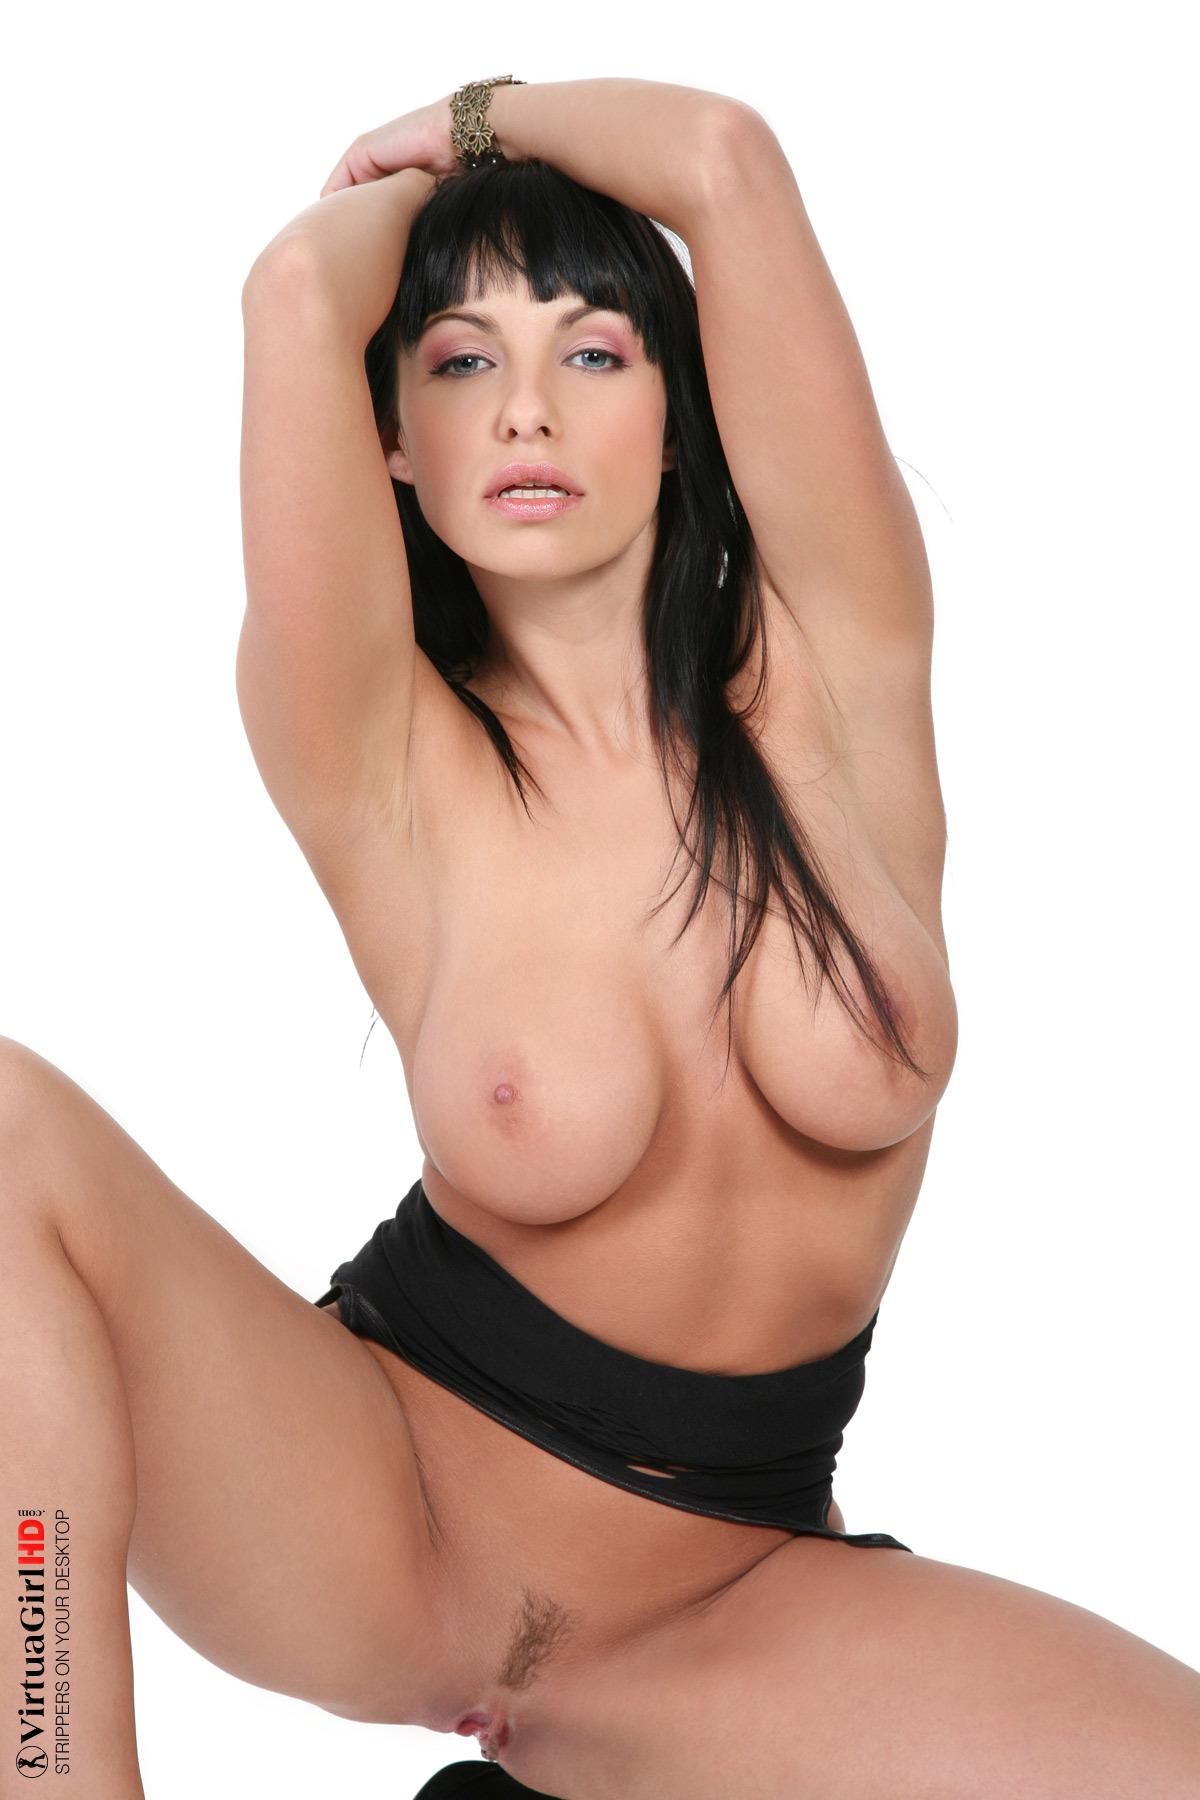 sexiest wallpaper art nude